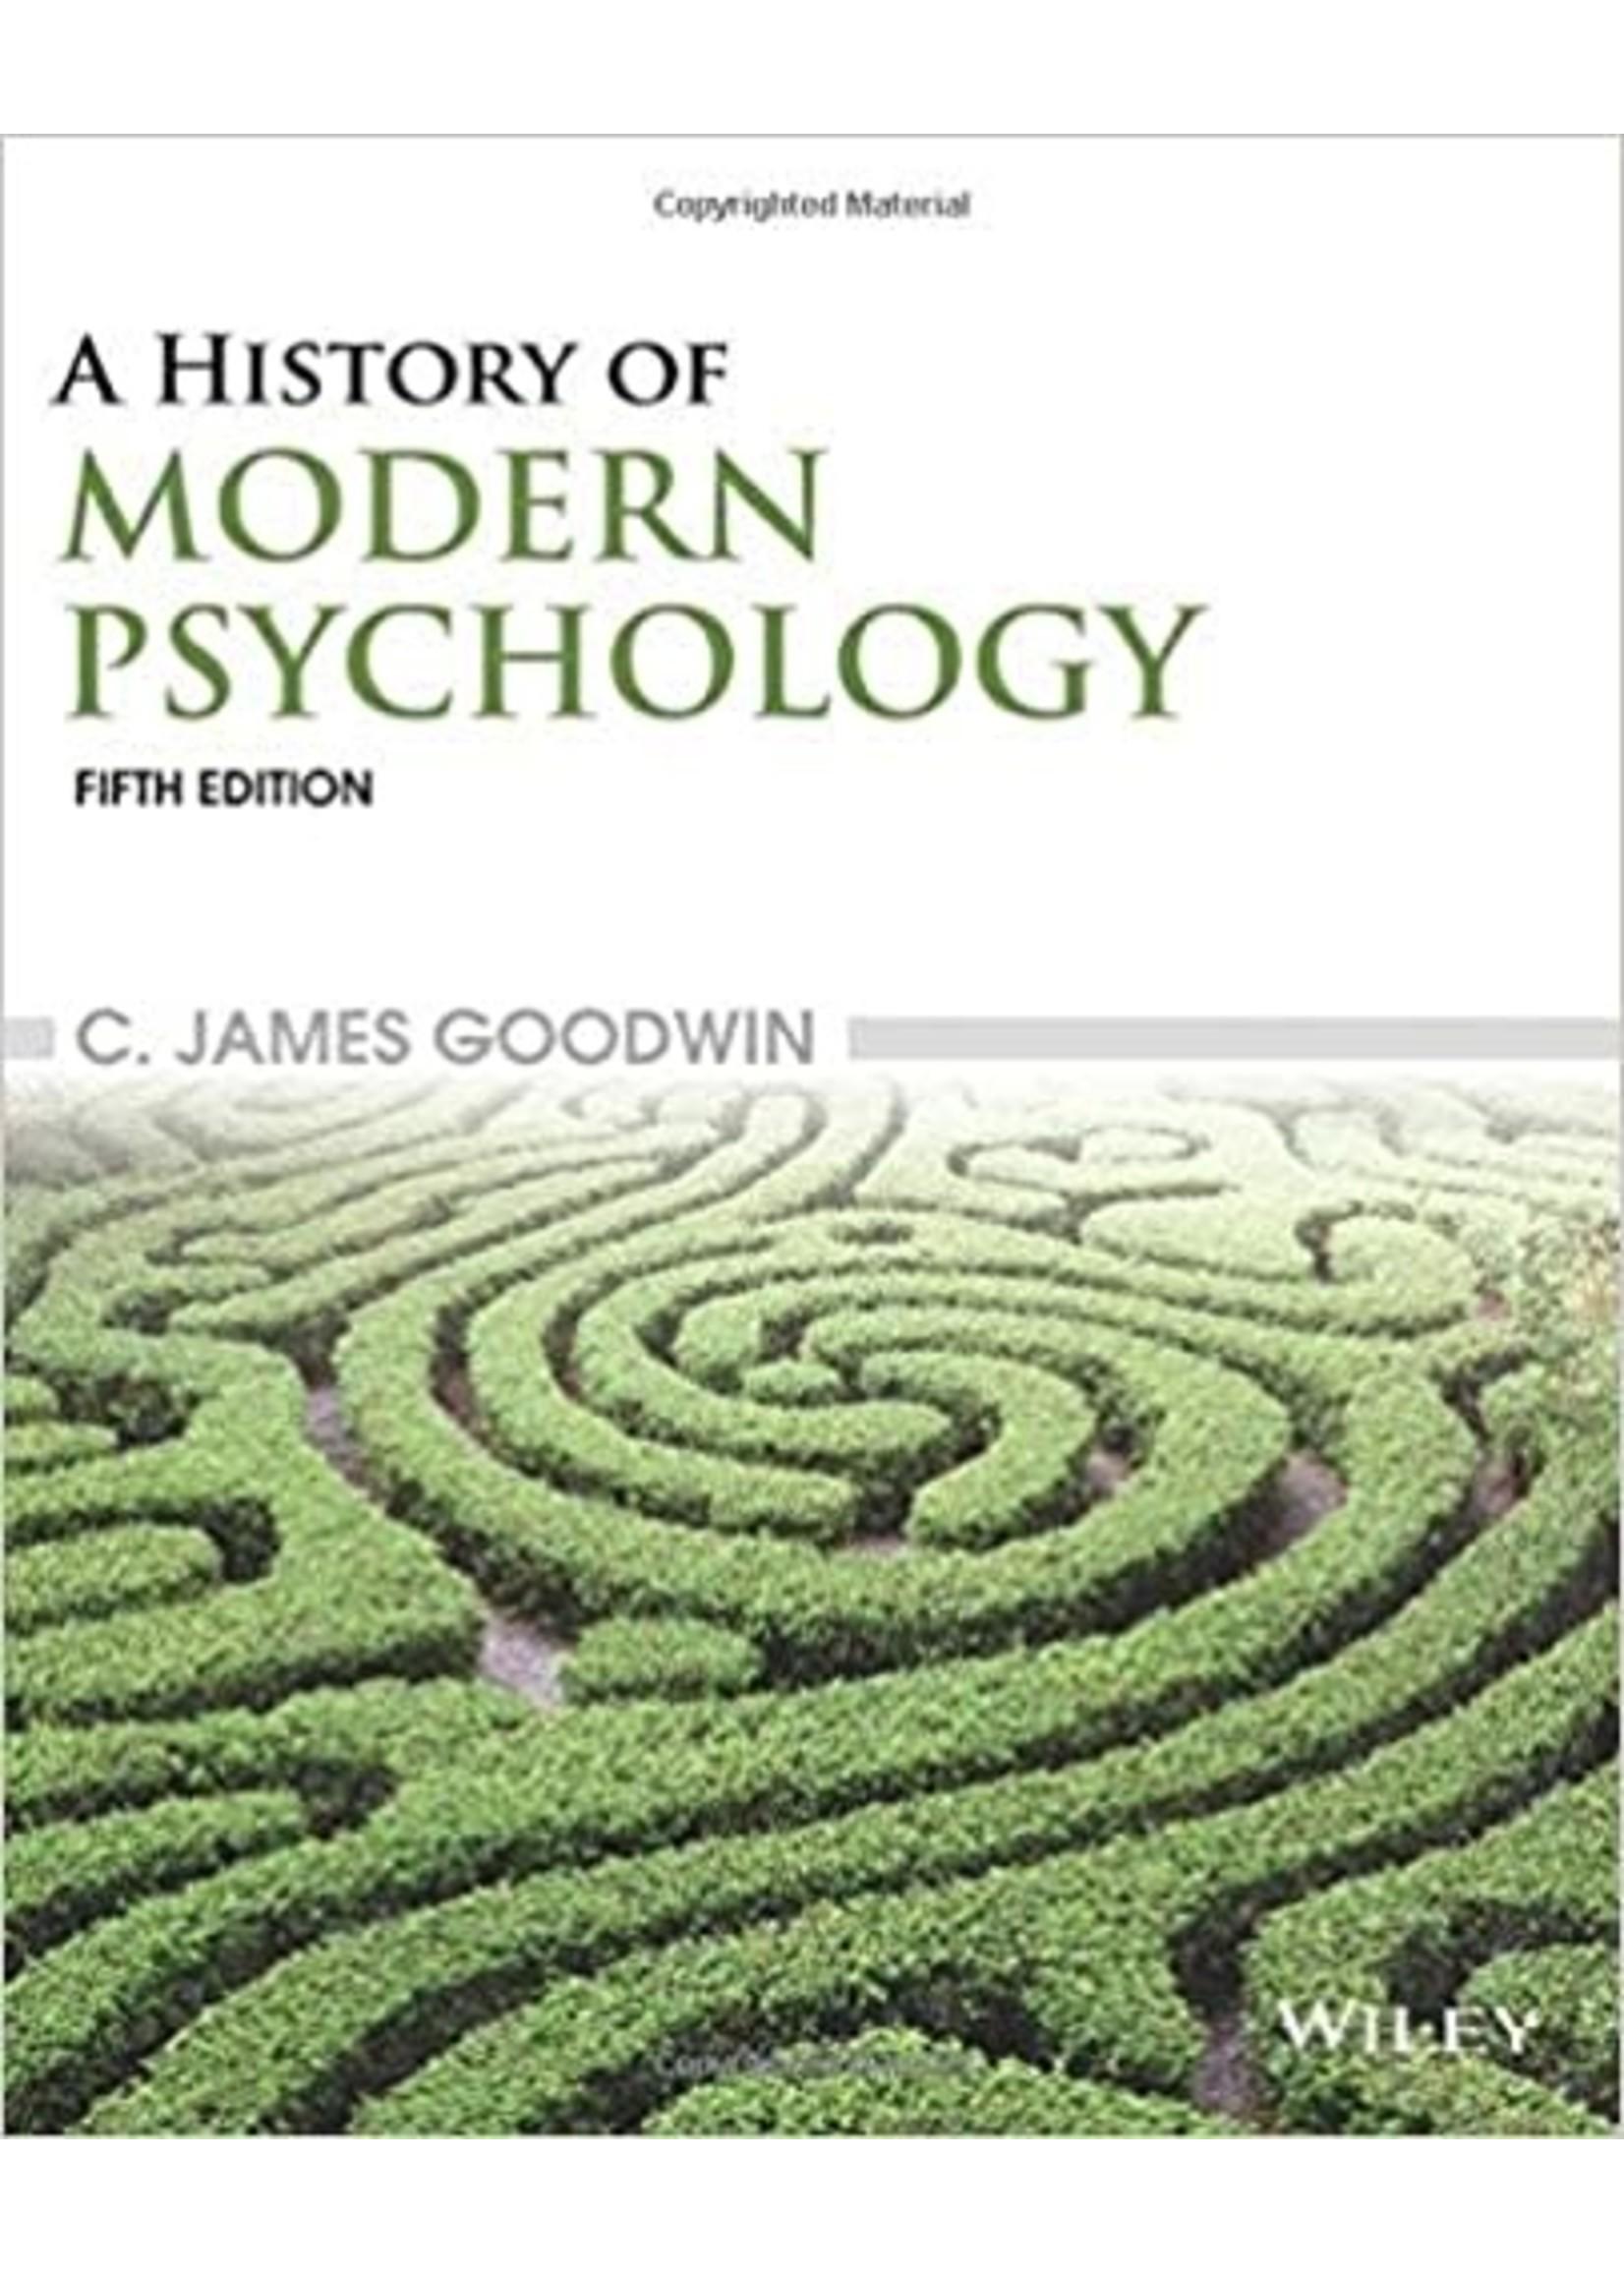 PSYC499 HISTORY OF MODERN PSYCHOLOGY (RENTAL)